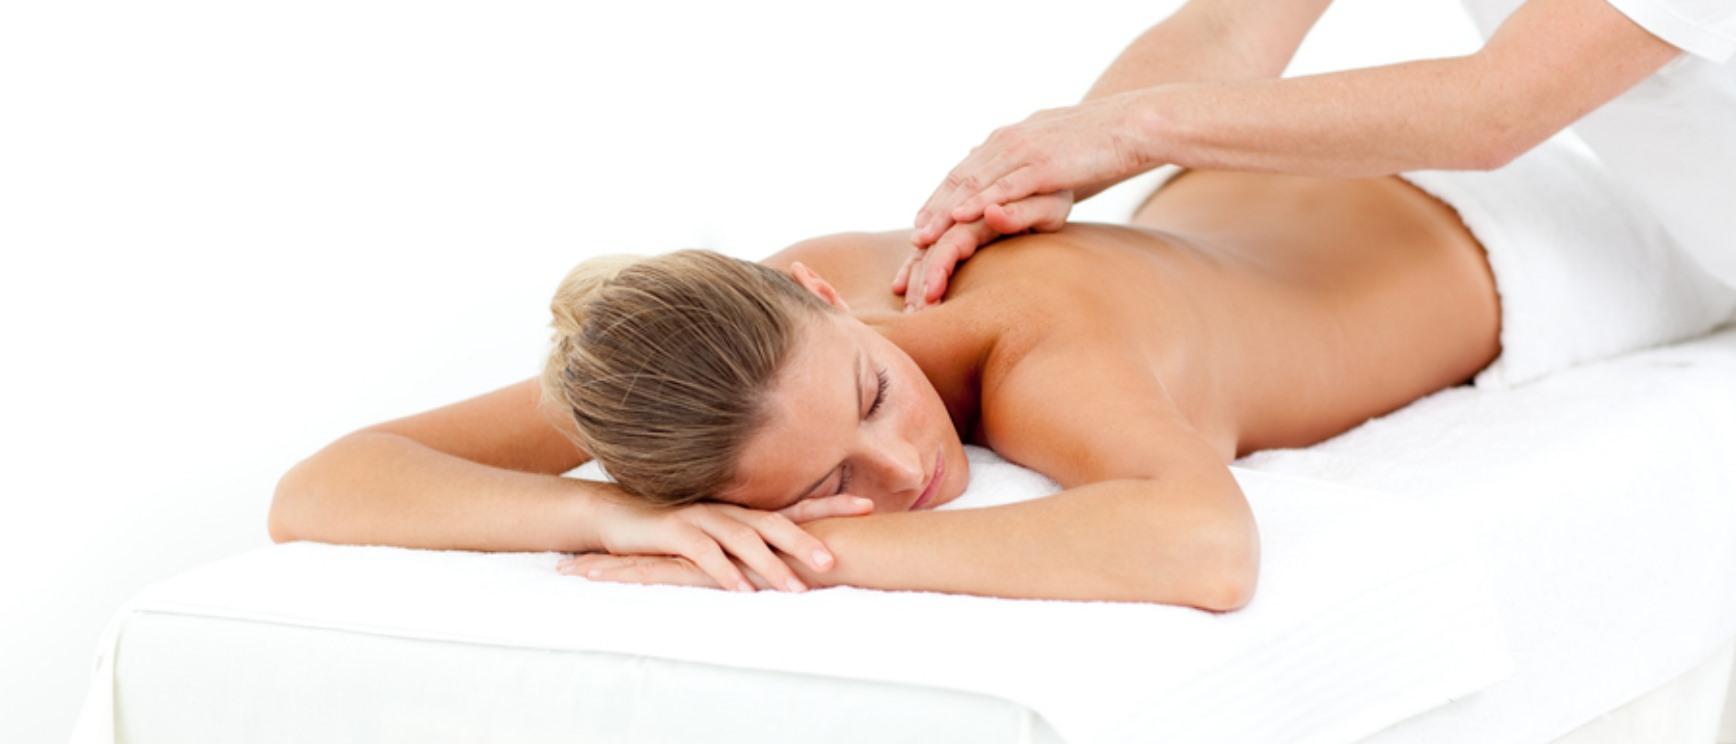 gratisporr body and soul thai massage